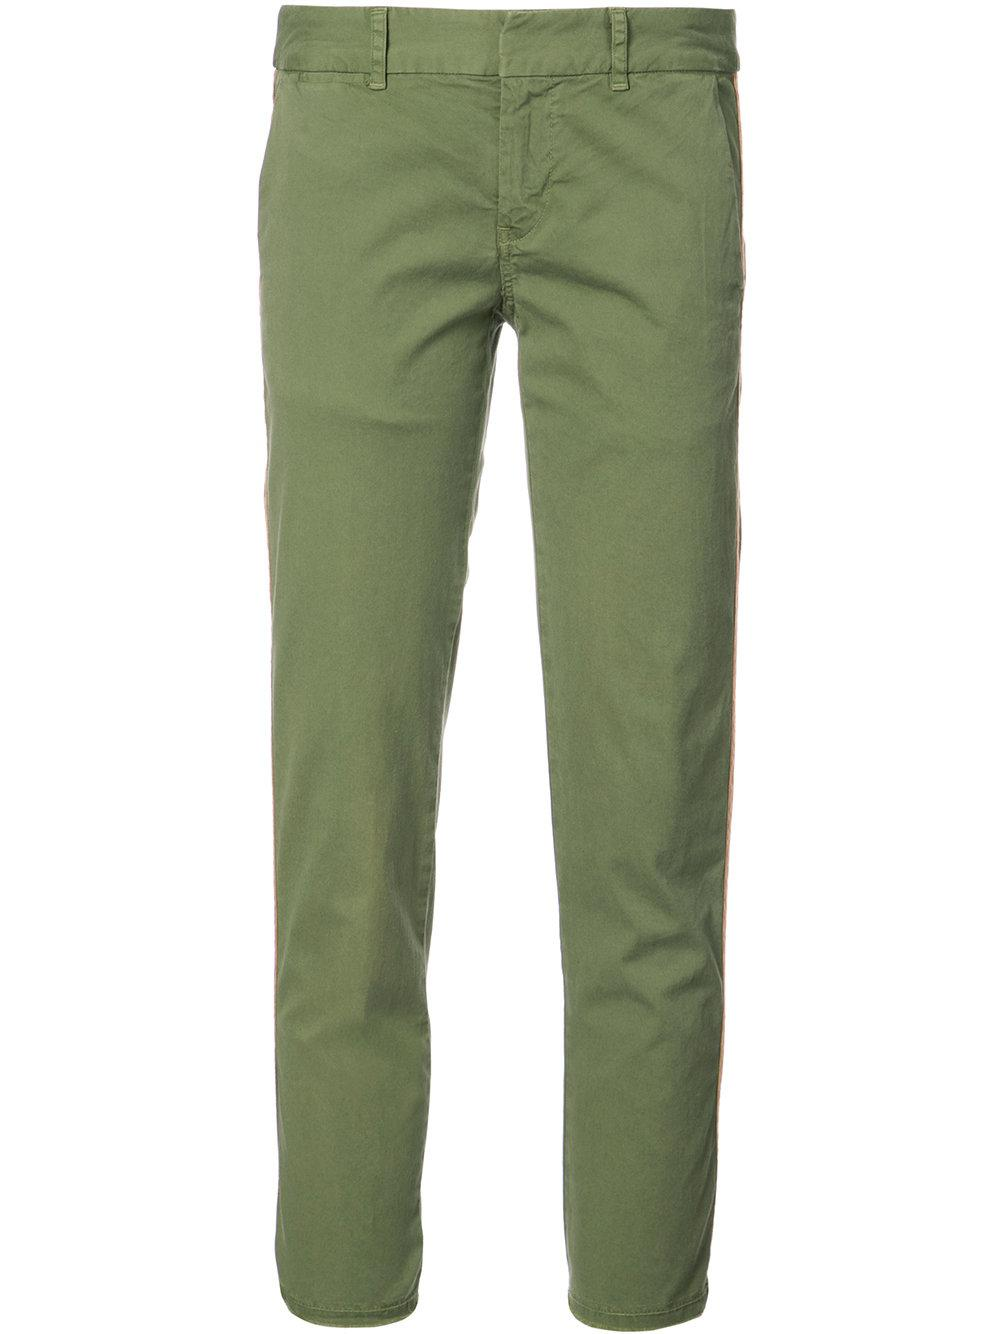 789cb7878 Nili Lotan East Hampton Stripe Panel Trousers in Blue - Lyst